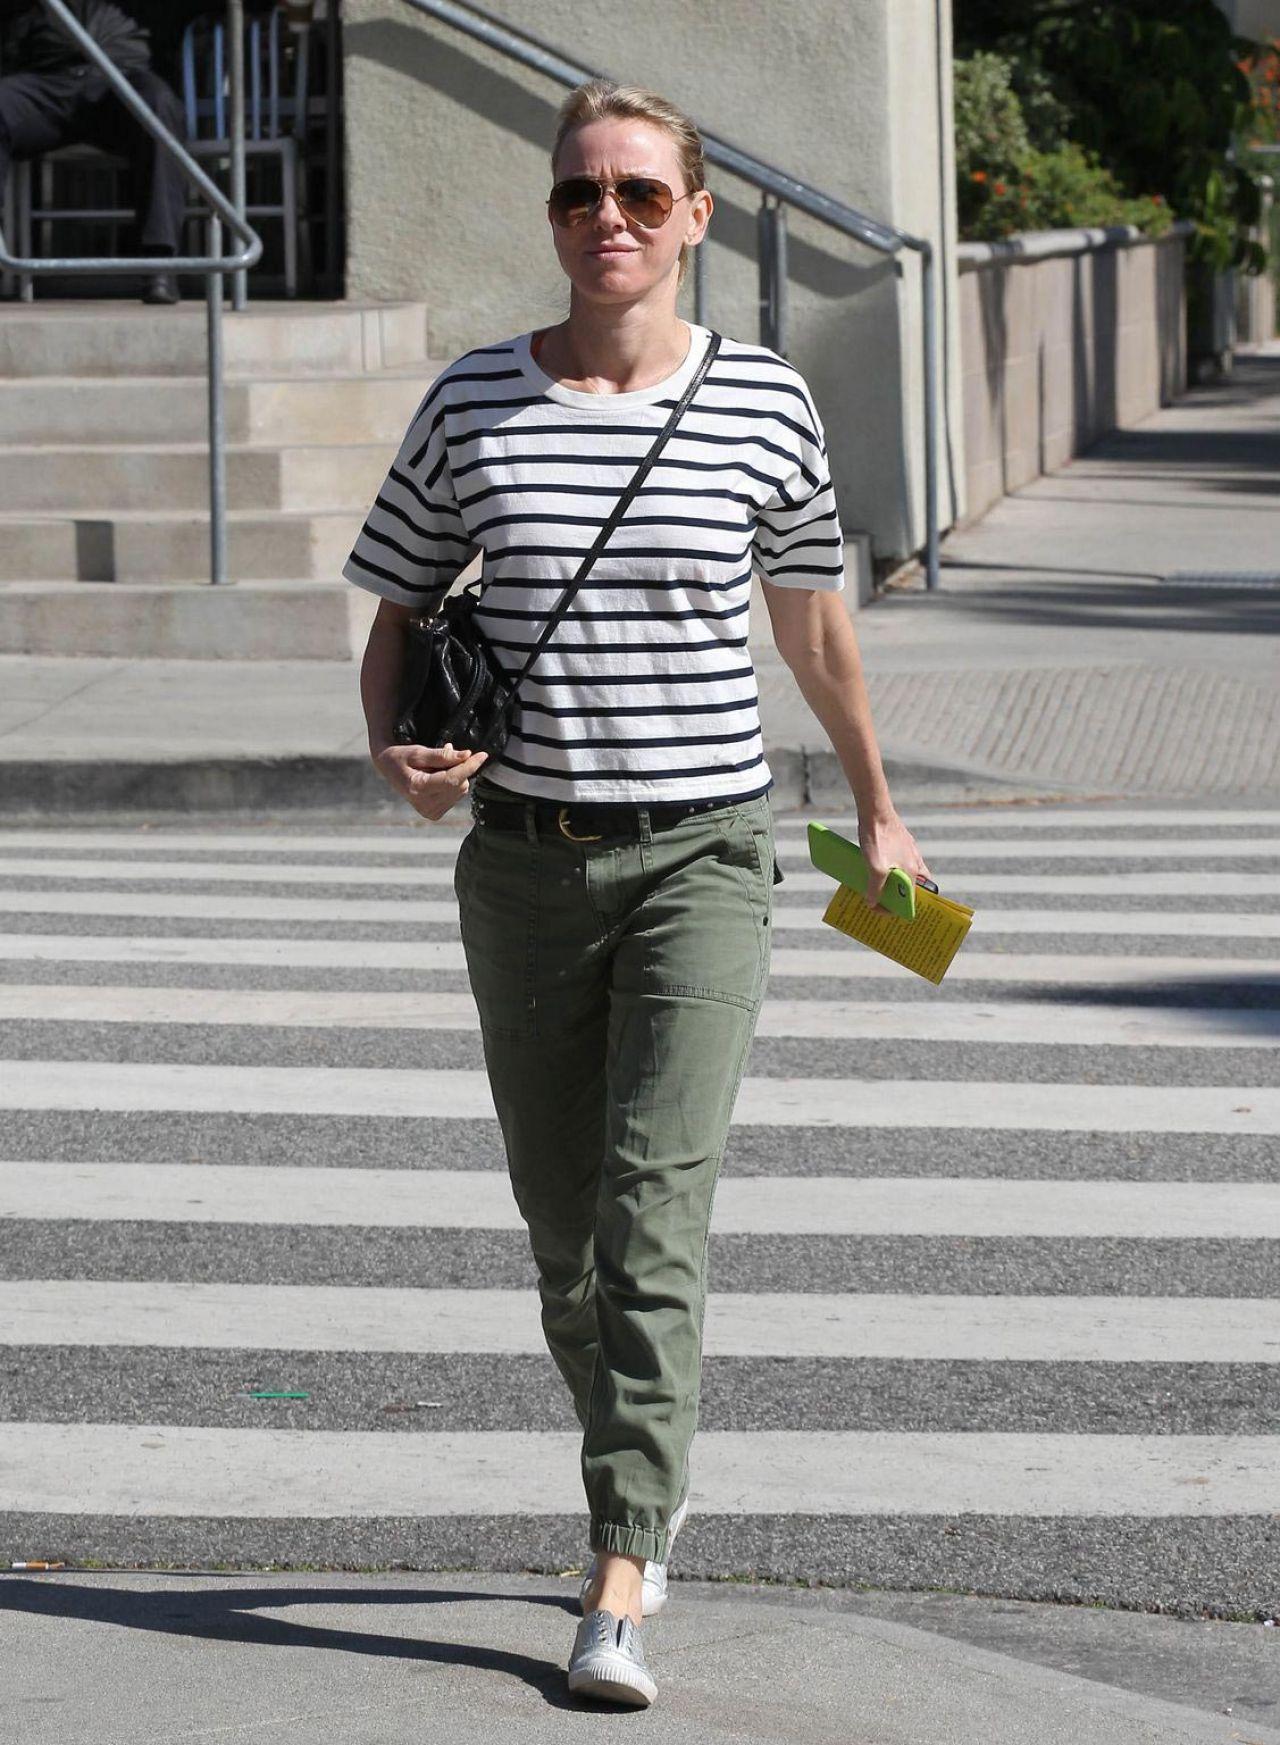 Naomi Watts 2015 Celebrity Photos Street Style Santa Monica California February